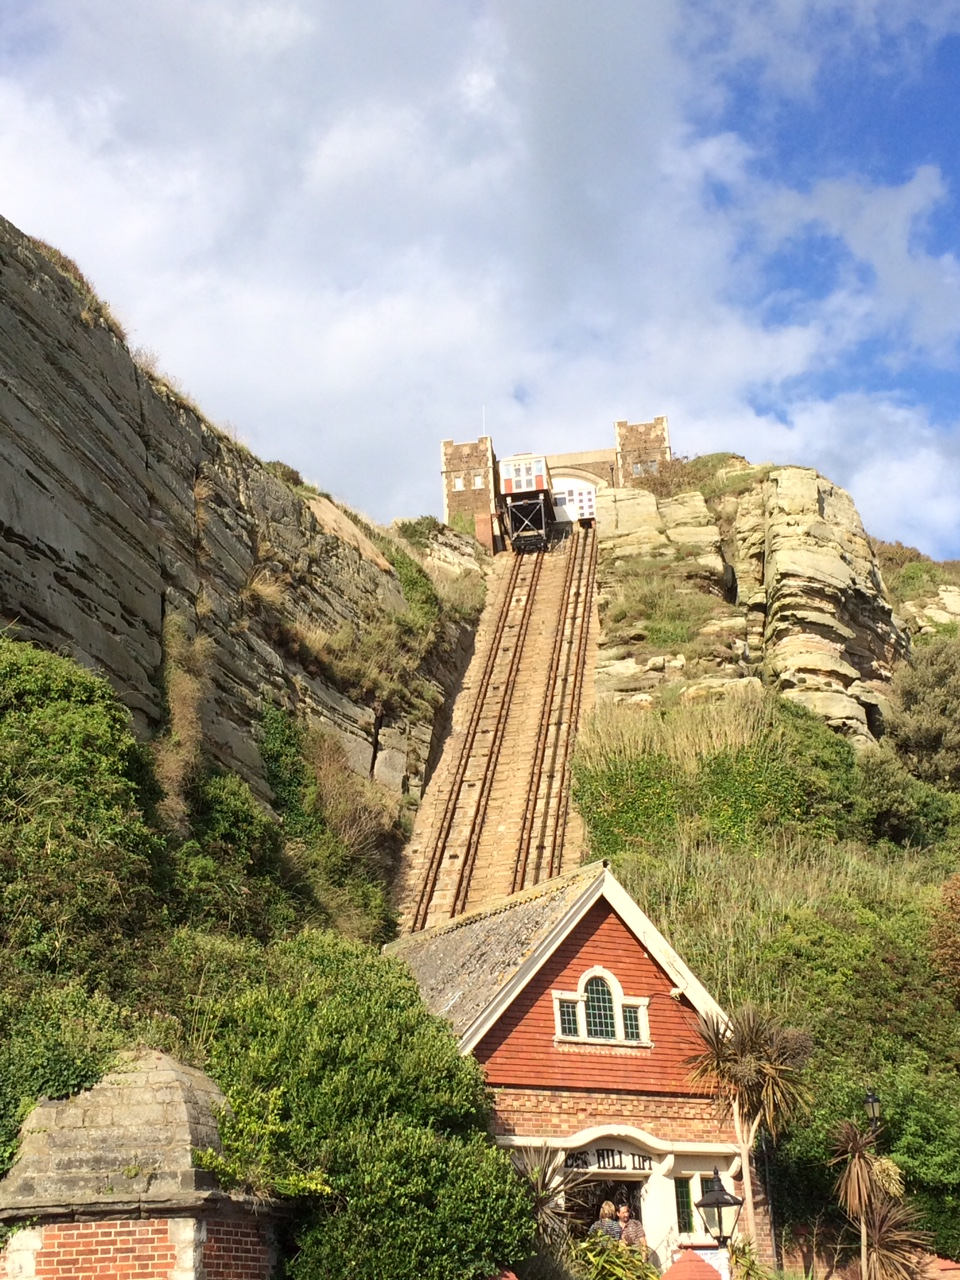 hastings funicular railway